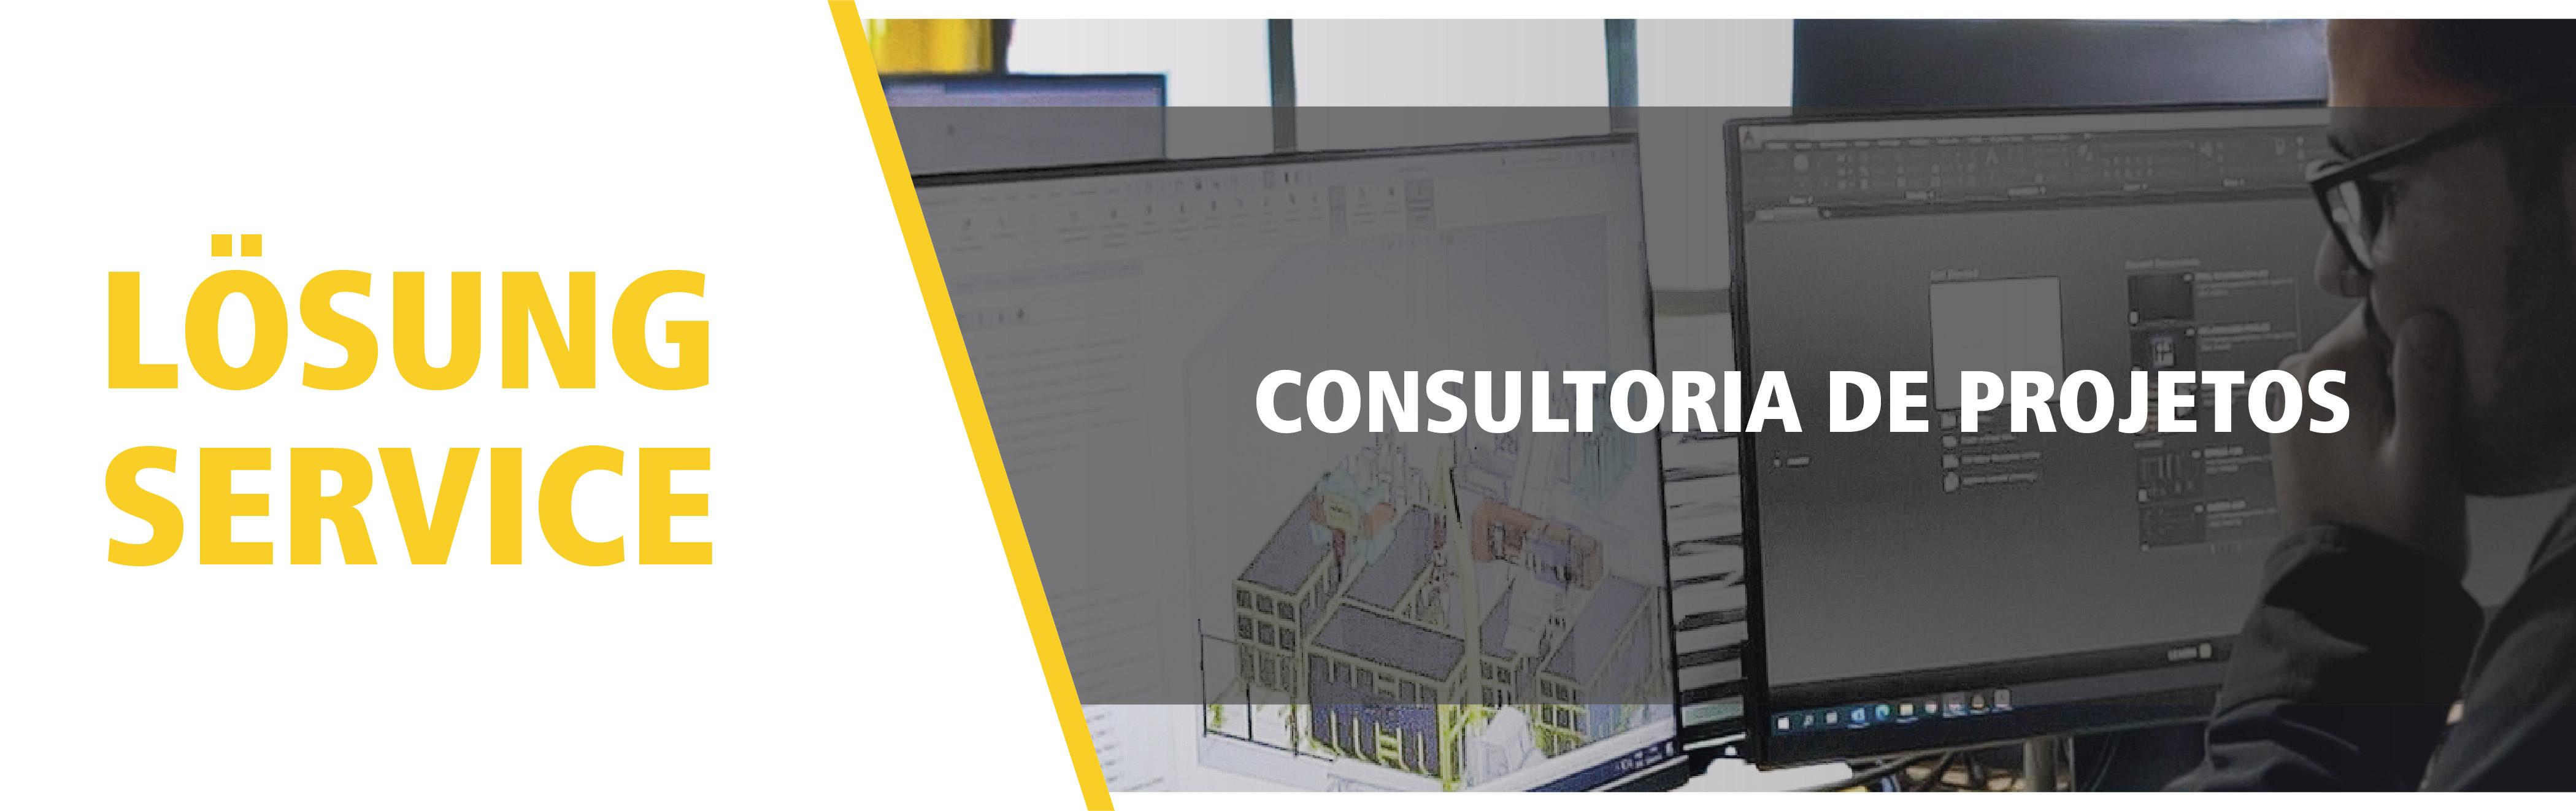 Consultoria de Projetos